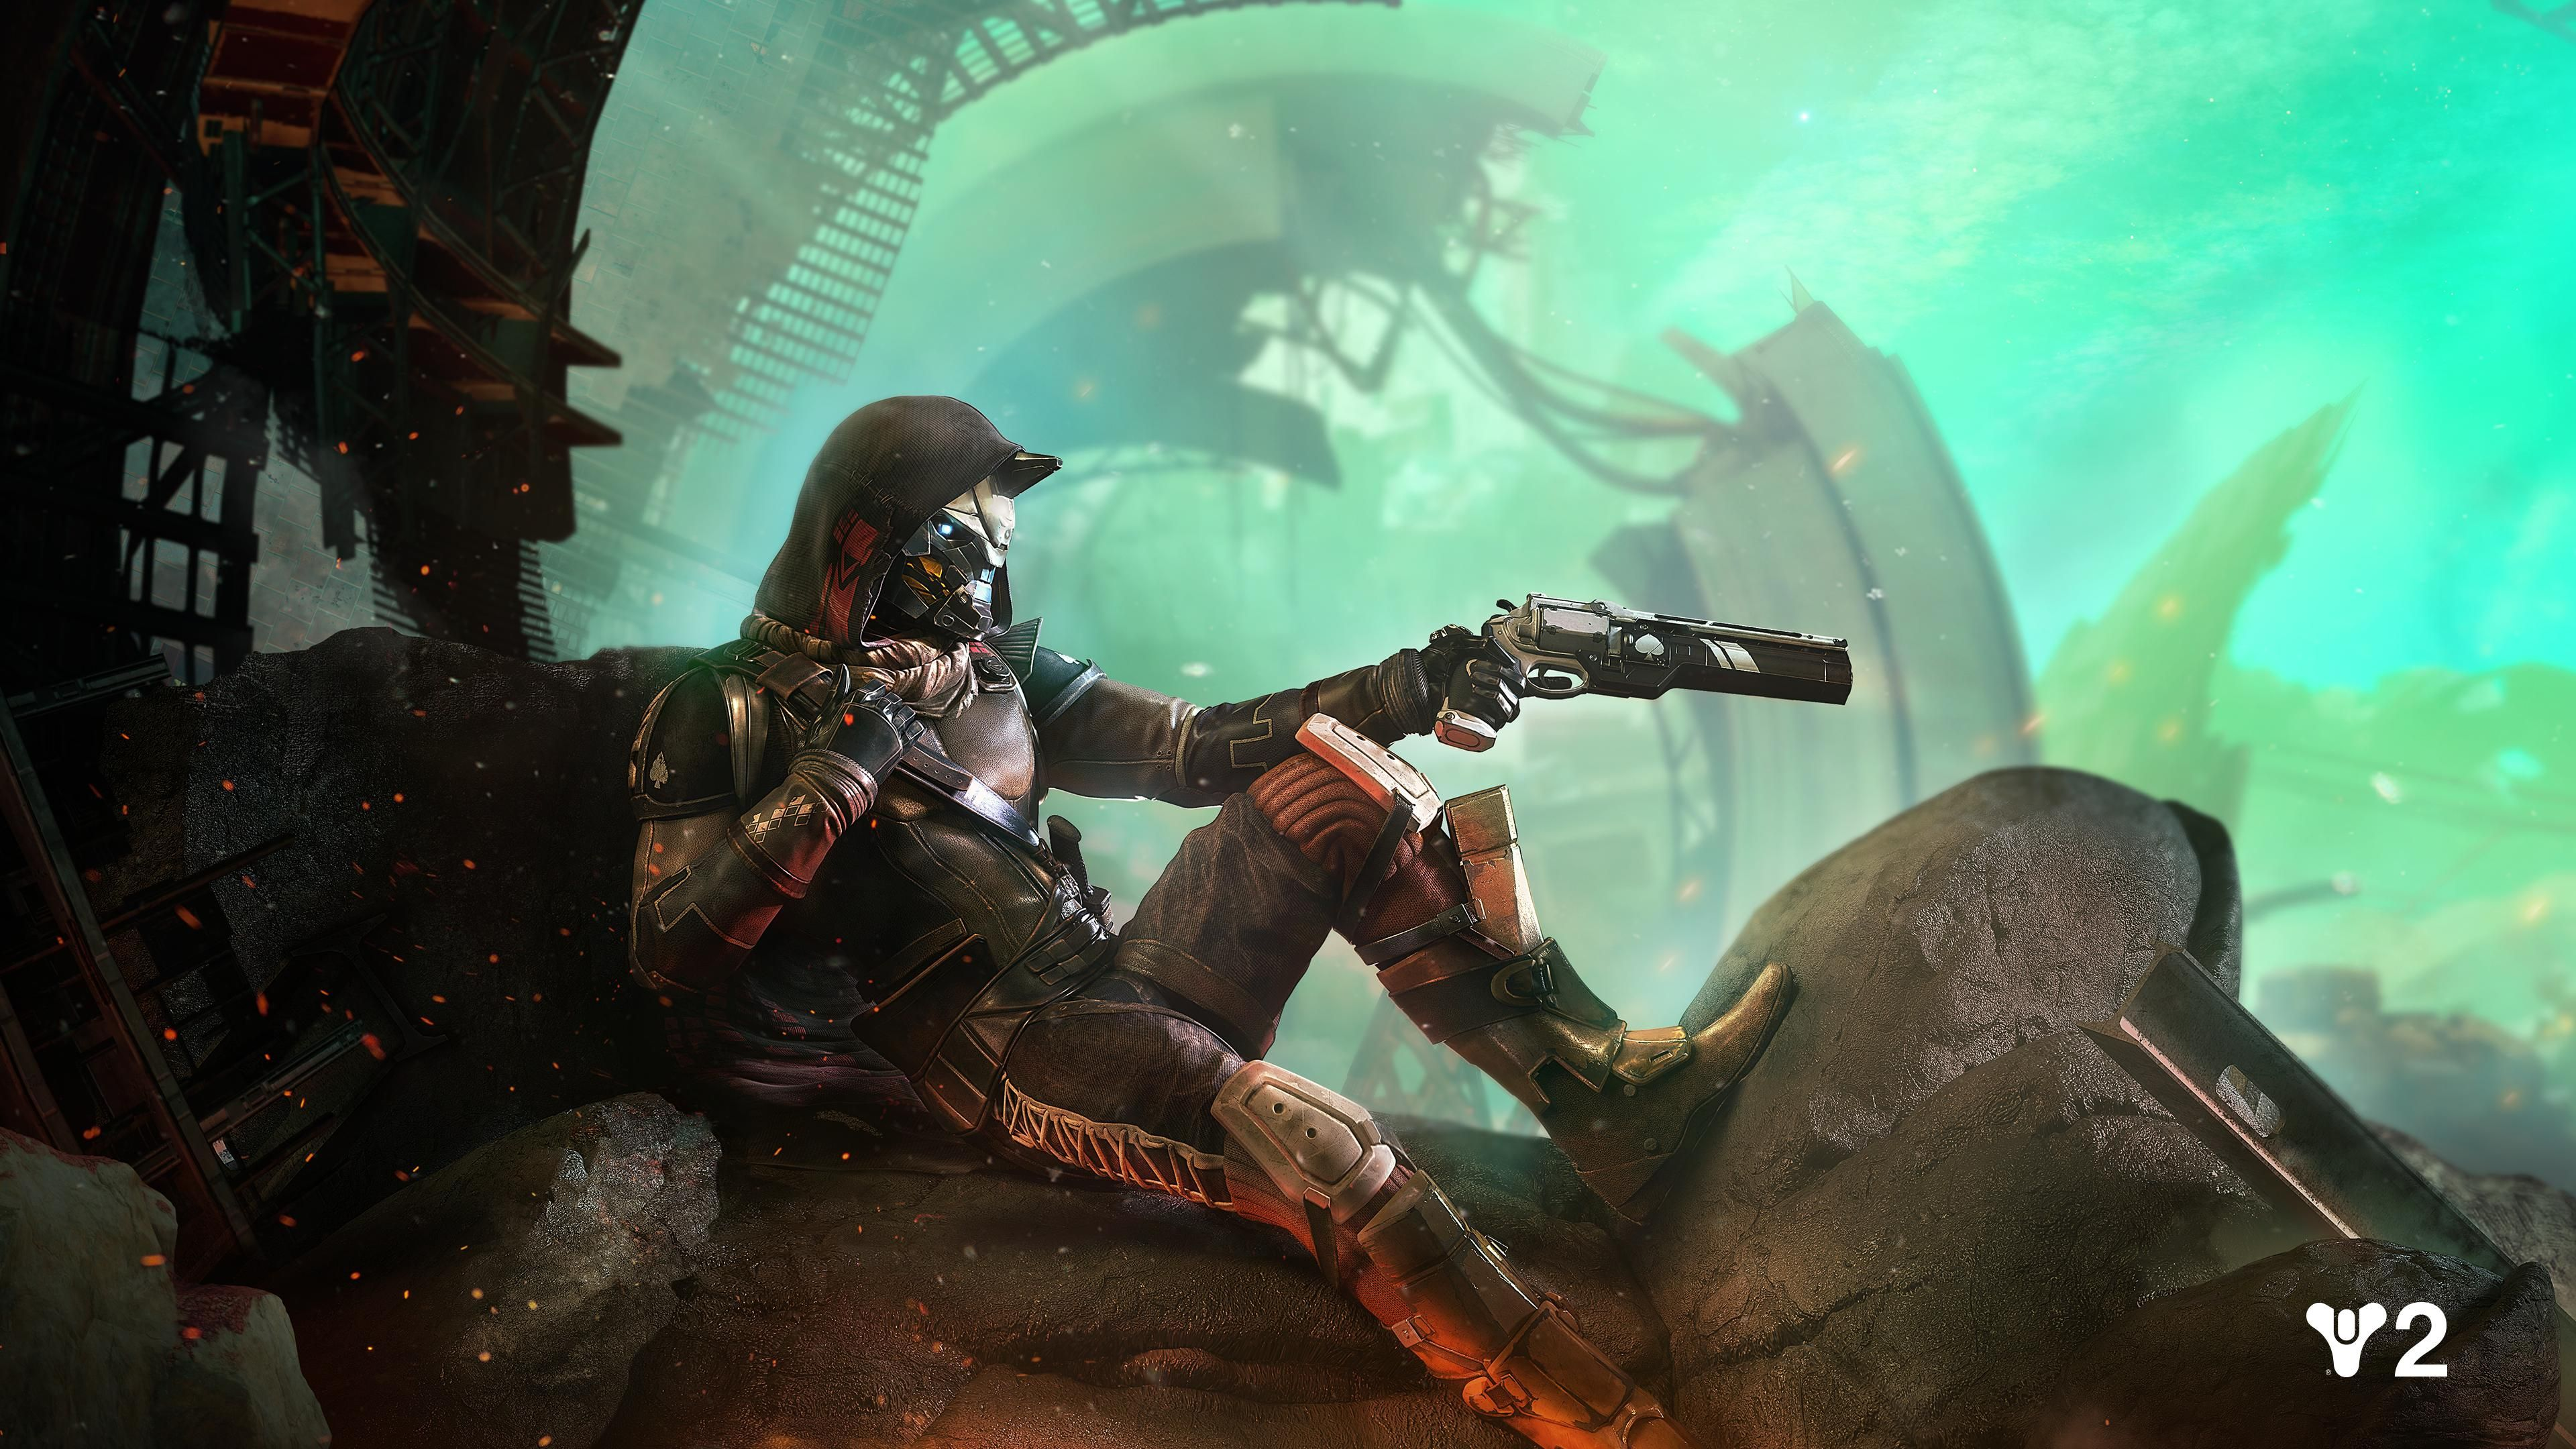 Destiny 2 Cayde 6 HD Games 4k Wallpapers Wallpaper